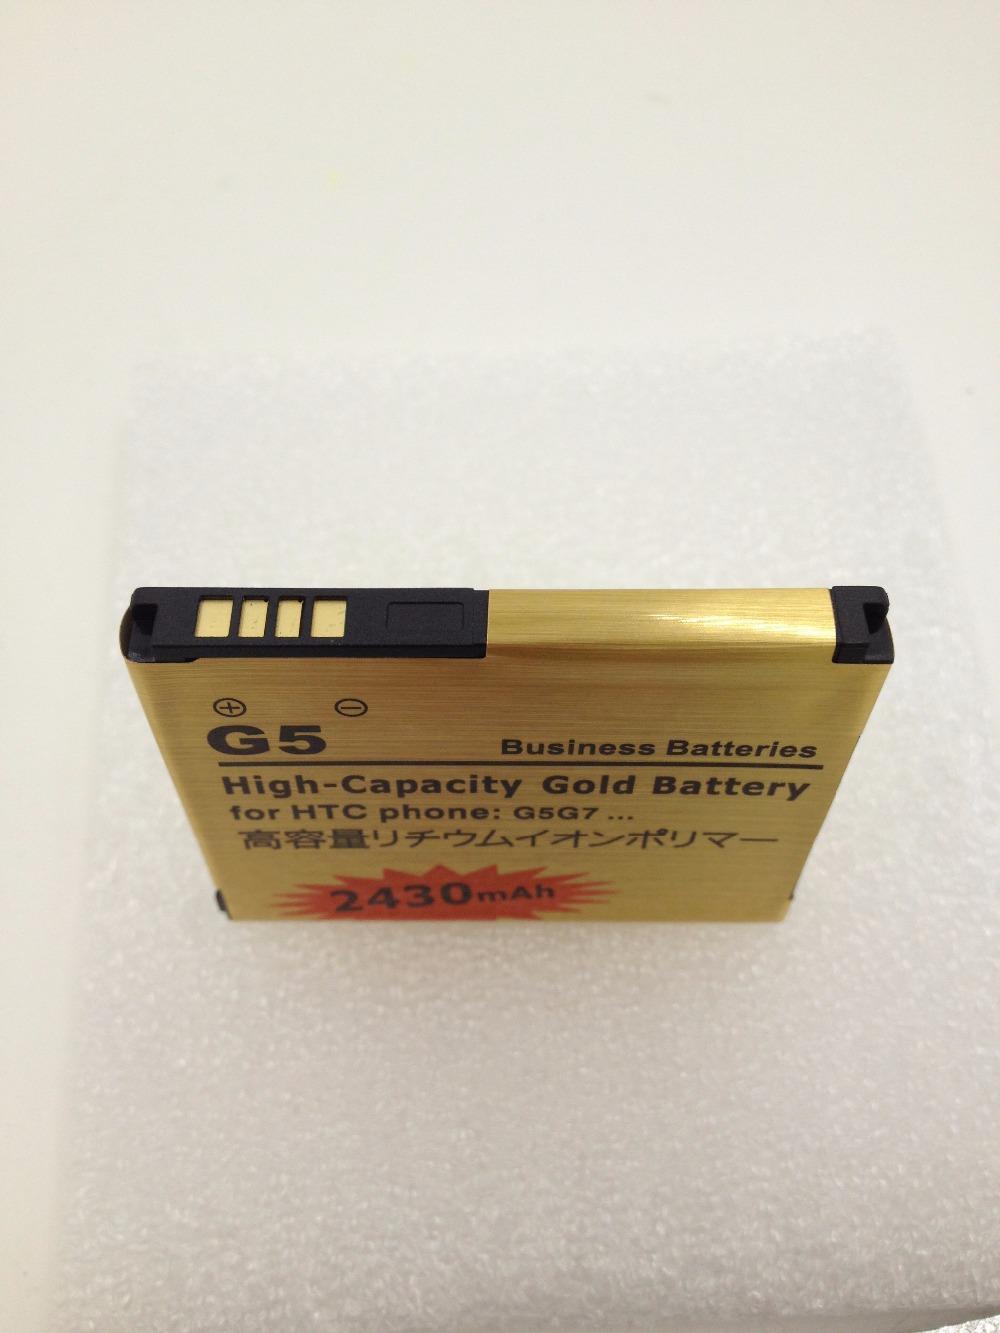 2430mAh Gold Battery For HTC Desire A8181 G5 Google Nexus One G7